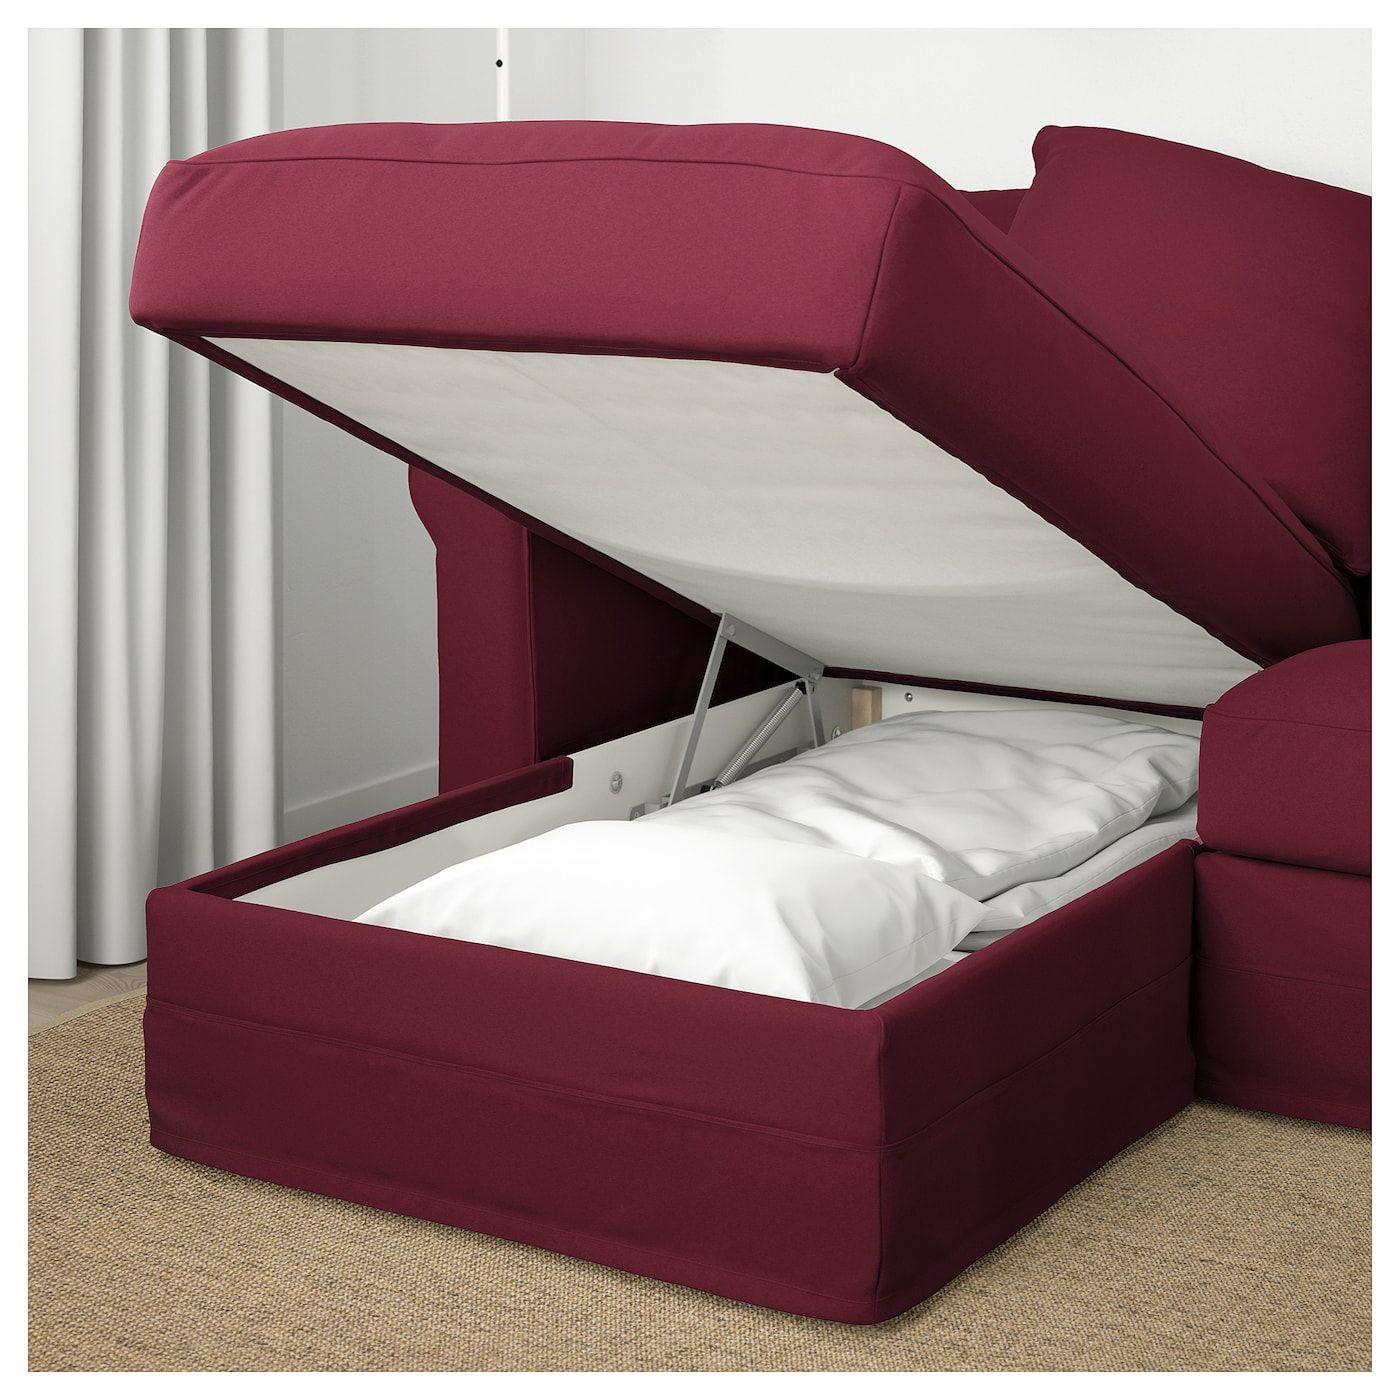 3er sofa gr nlid mit r camiere ljungen dunkelrot home sofa rh pinterest com